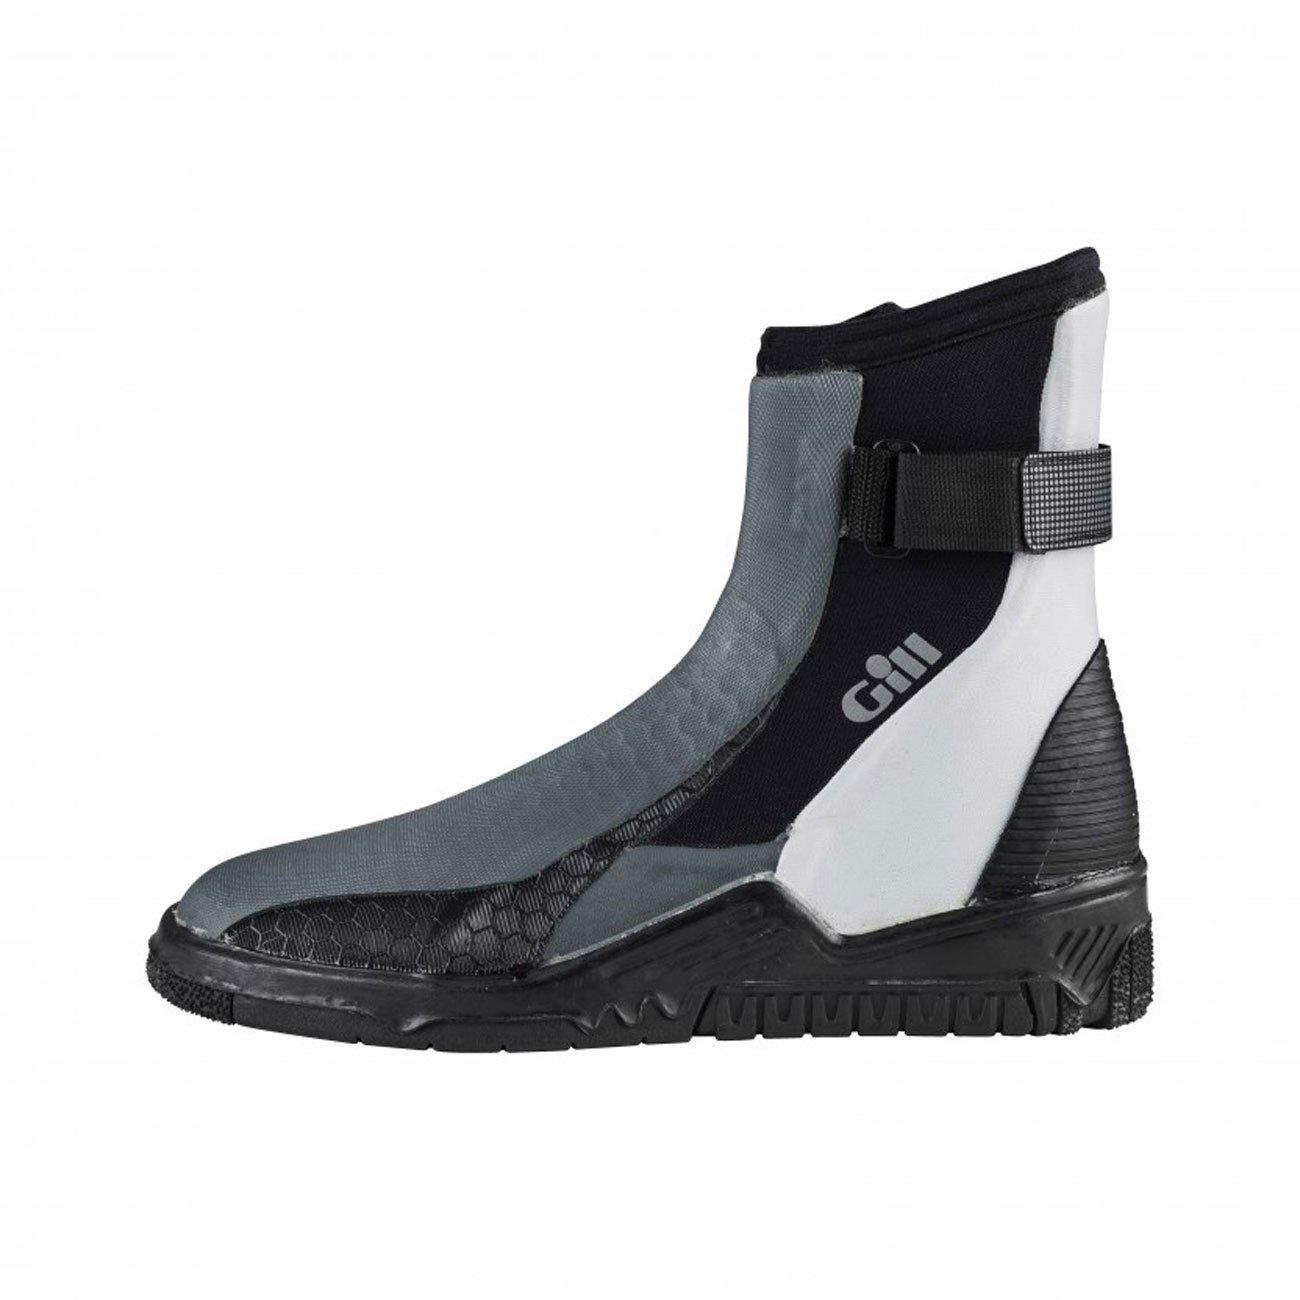 Noir  2016 Gill 5mm Hiking bottes noir argent 906